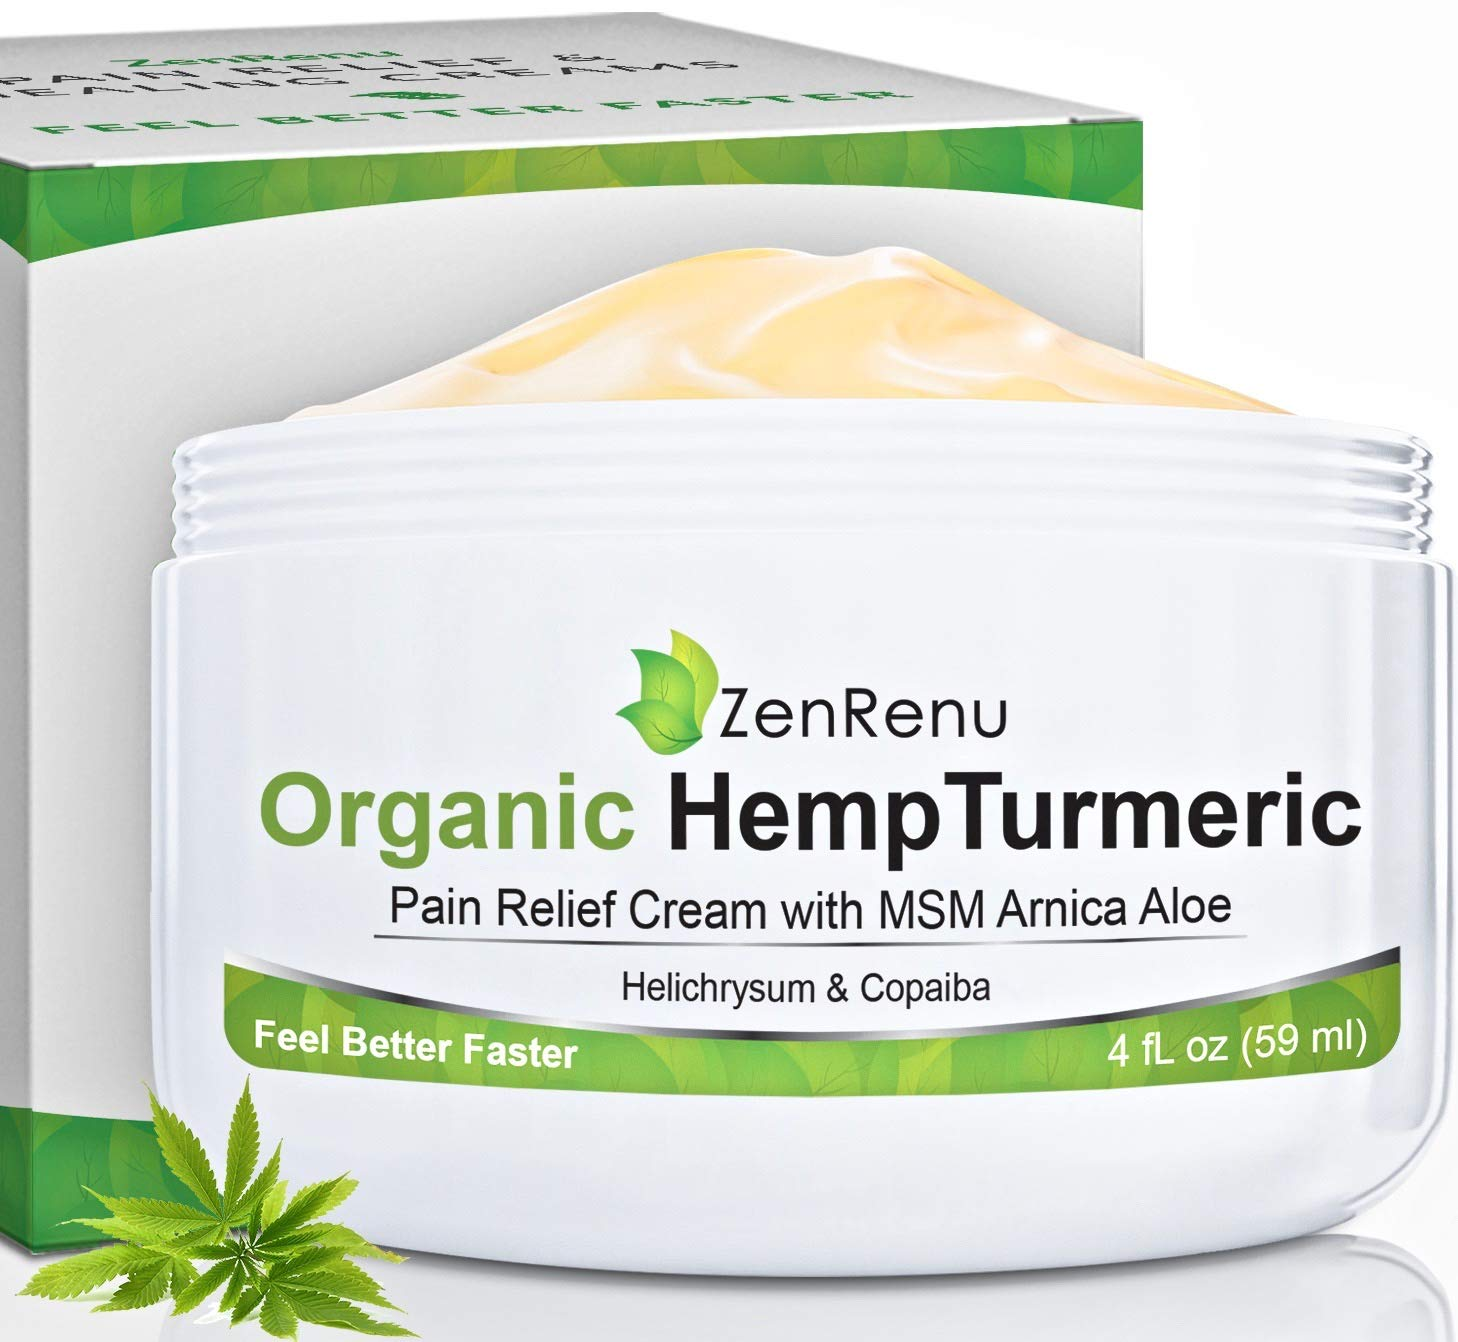 Organic Hemp Pain Relief Cream Large (4 oz) Value Size by ZenRenu - MSM Turmeric Arnica - Made in USA Premium Hemp Extract & Hemp Oil for Pain Relief